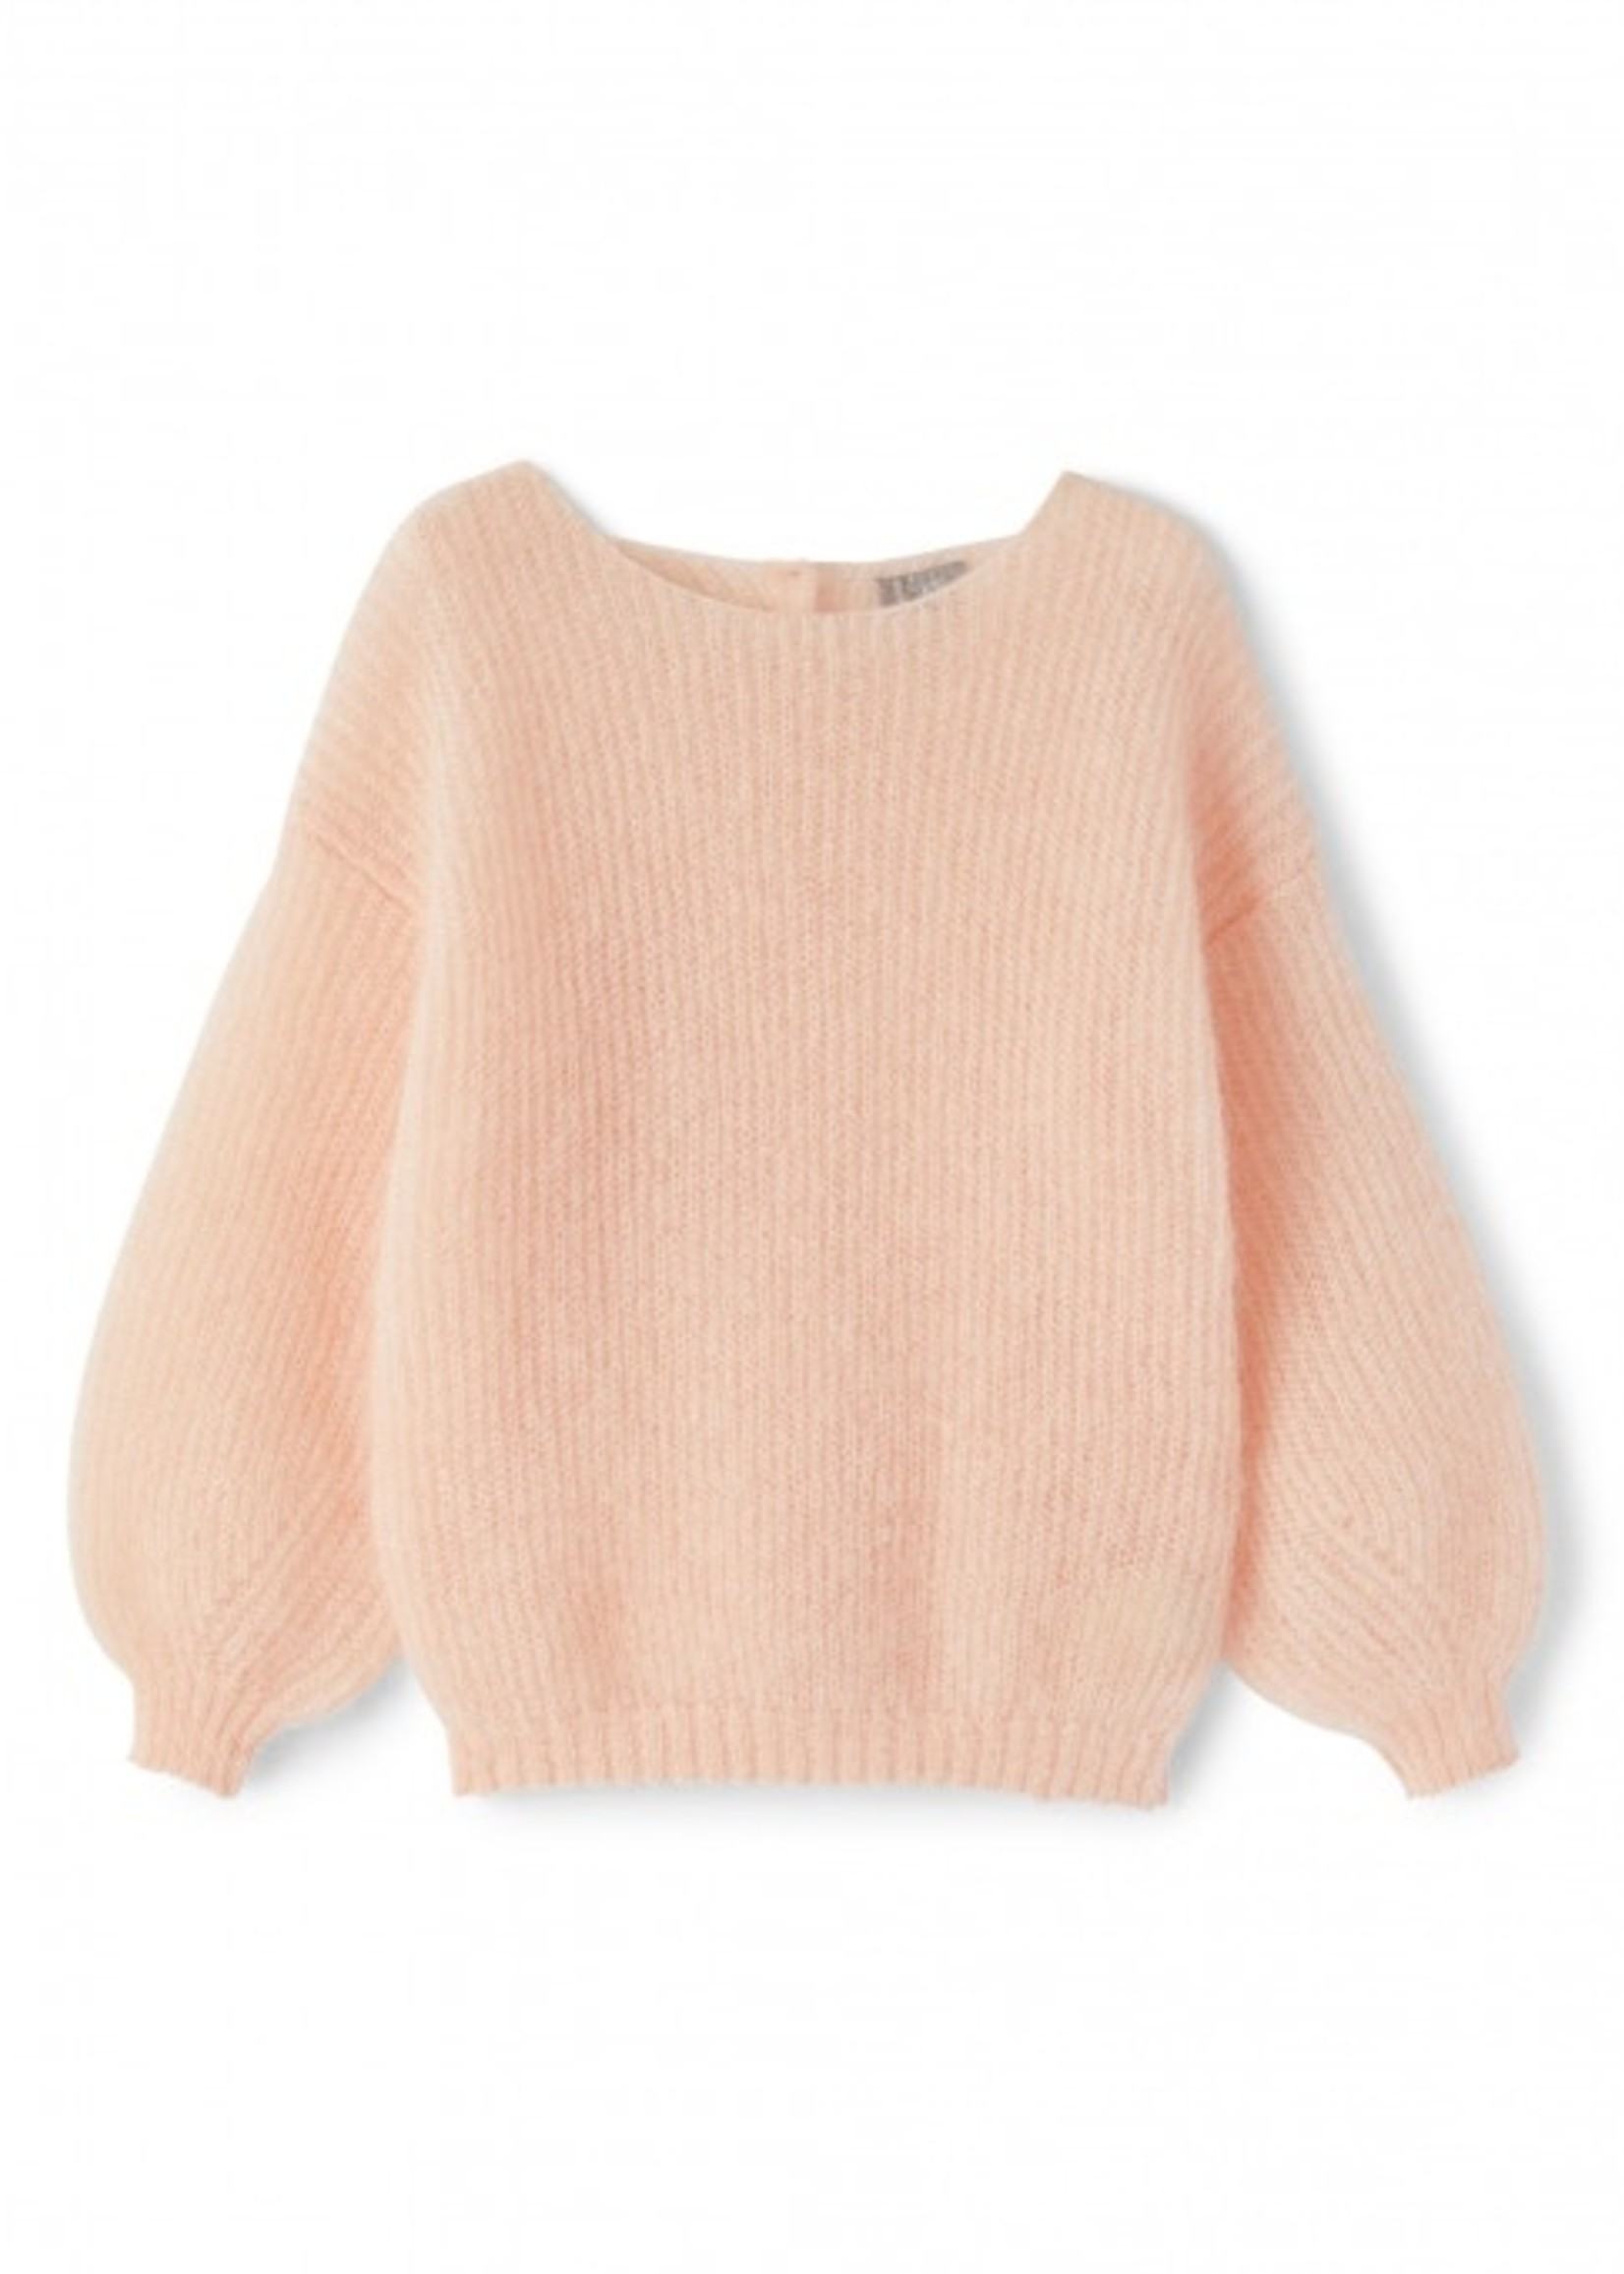 Il Gufo Il Gufo-AW21 Girls Sweater A21 MA377